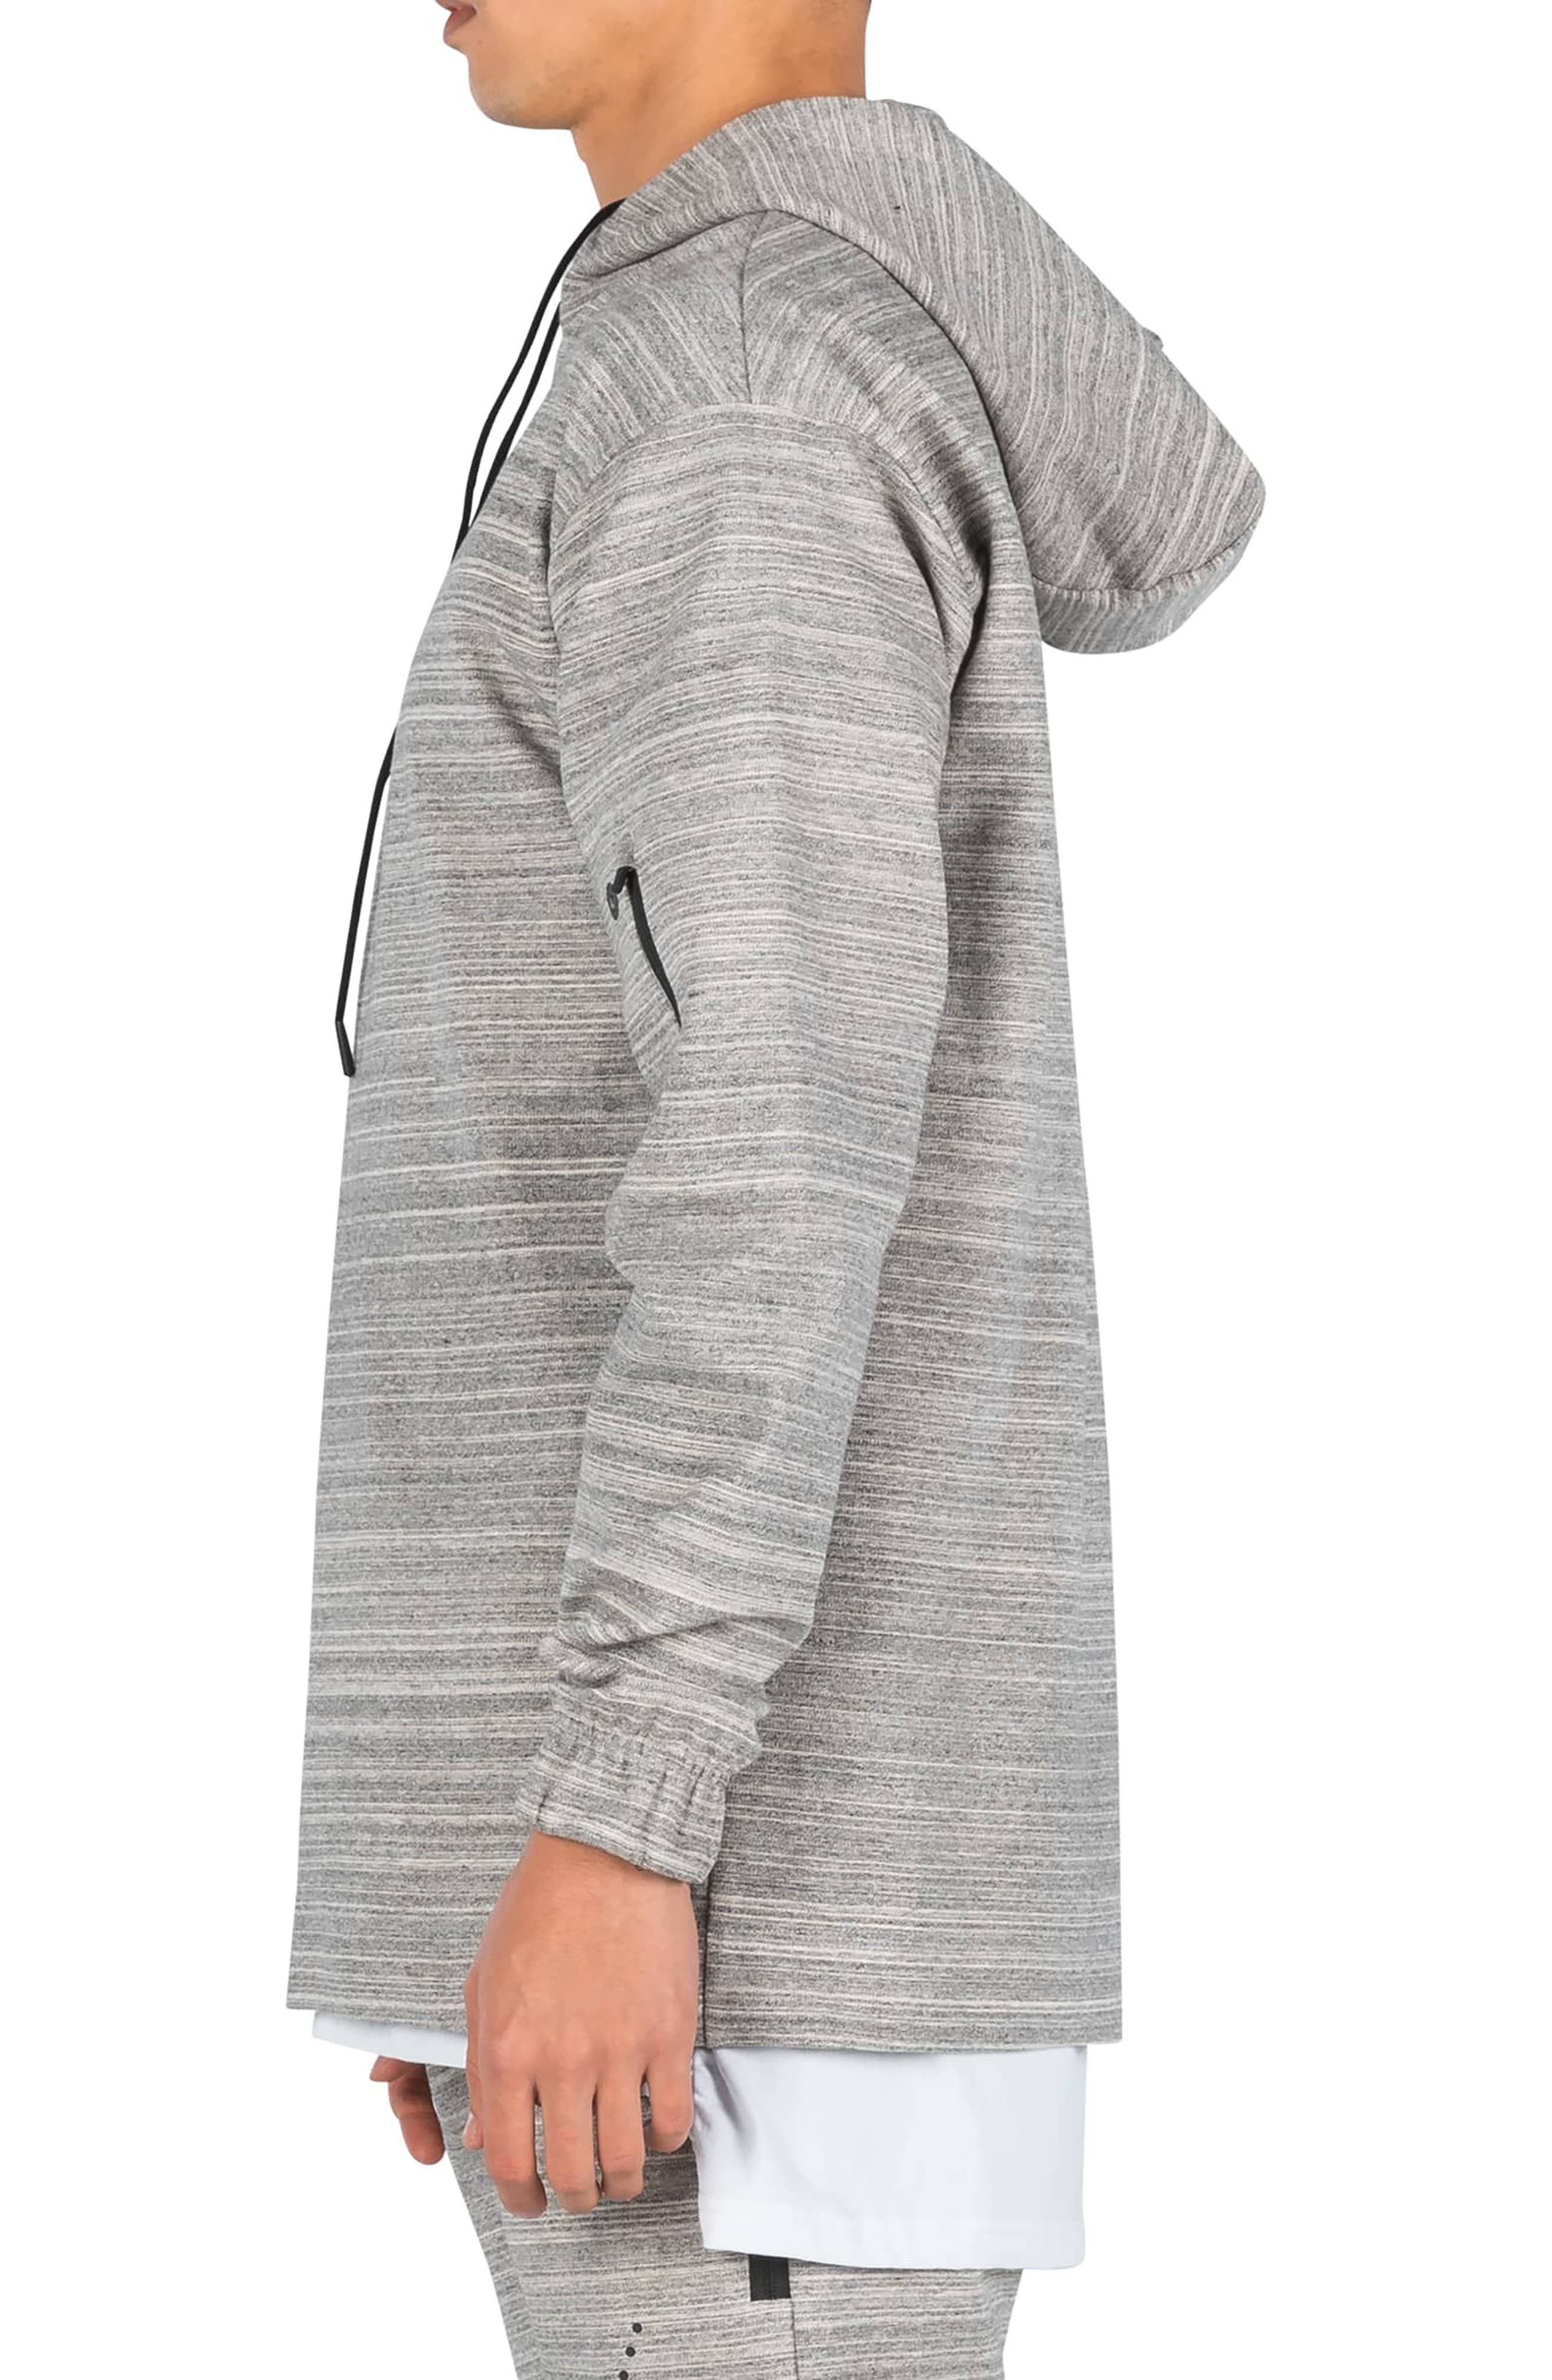 Tech Hoodie Sweatshirt,                             Alternate thumbnail 3, color,                             031